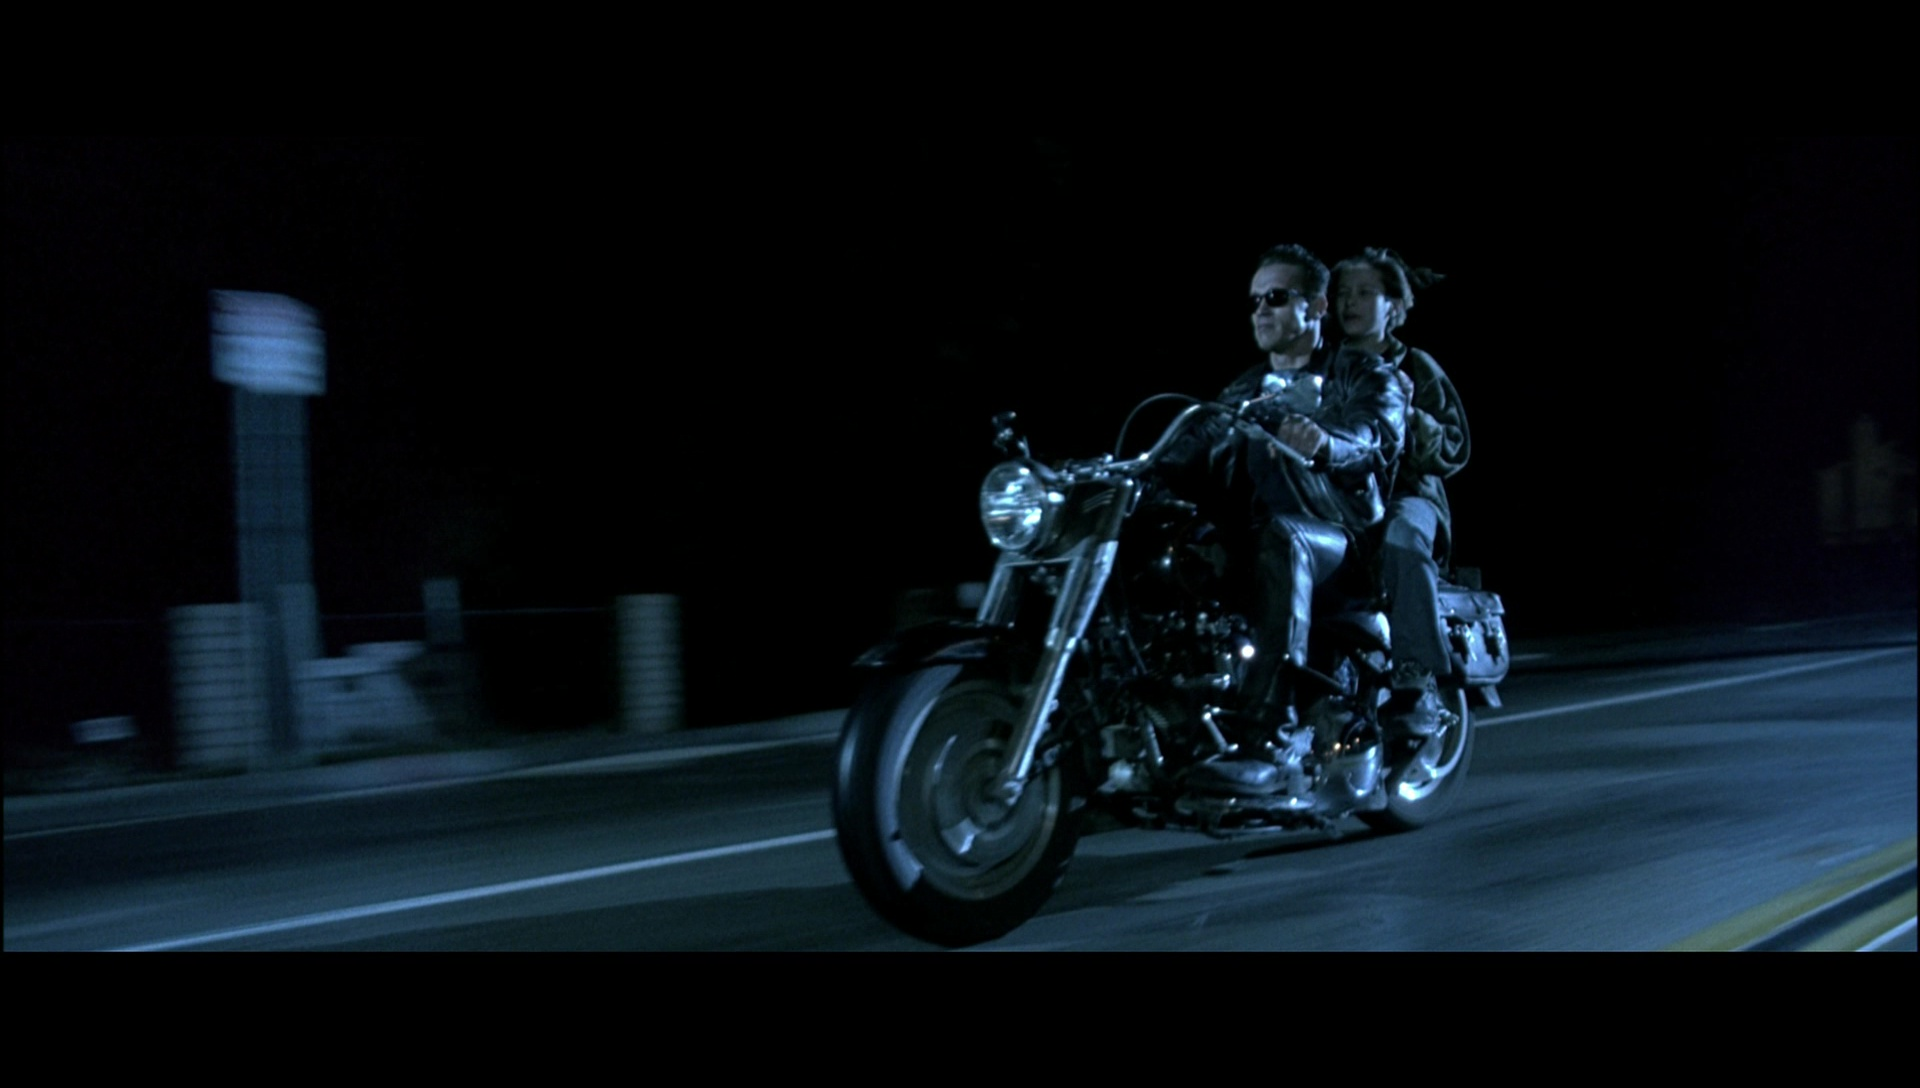 harleydavidson motorcycle driven by arnold schwarzenegger